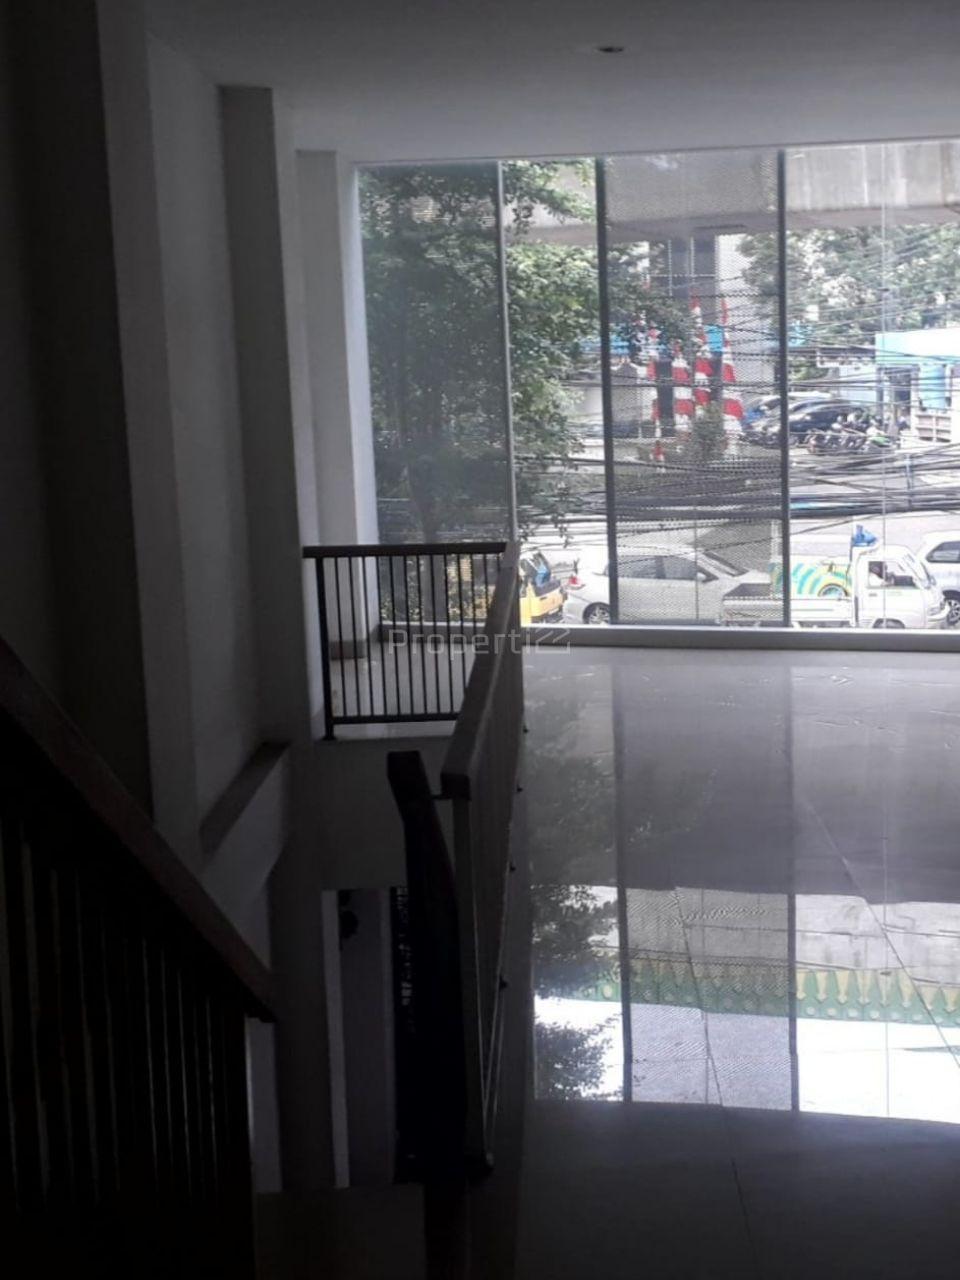 Gedung Baru 5 Lantai di Area Bisnis Mampang Prapatan, Jakarta Selatan